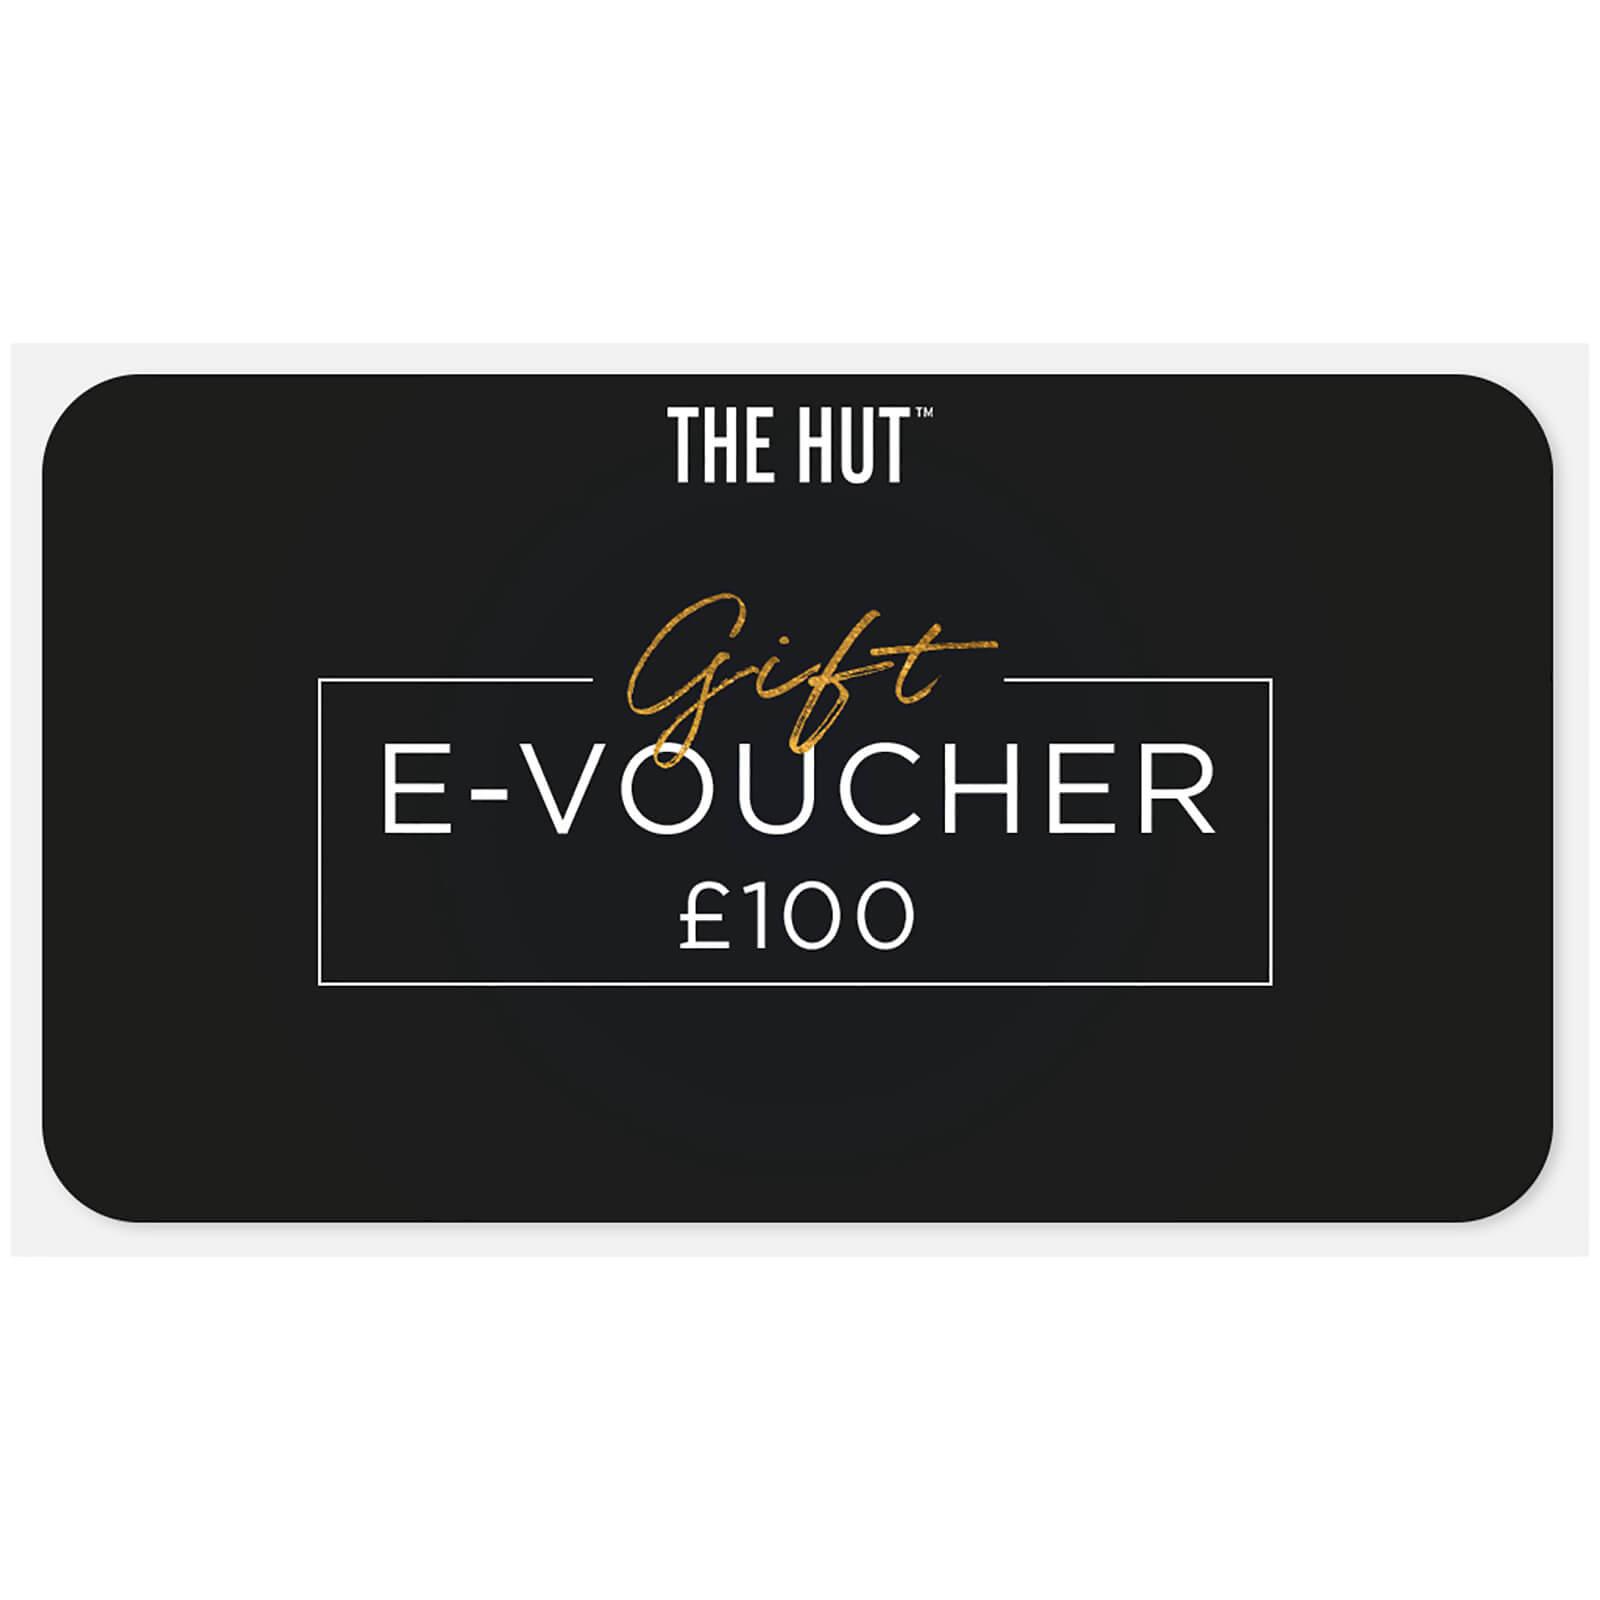 The Hut £100 The Hut Gift Voucher